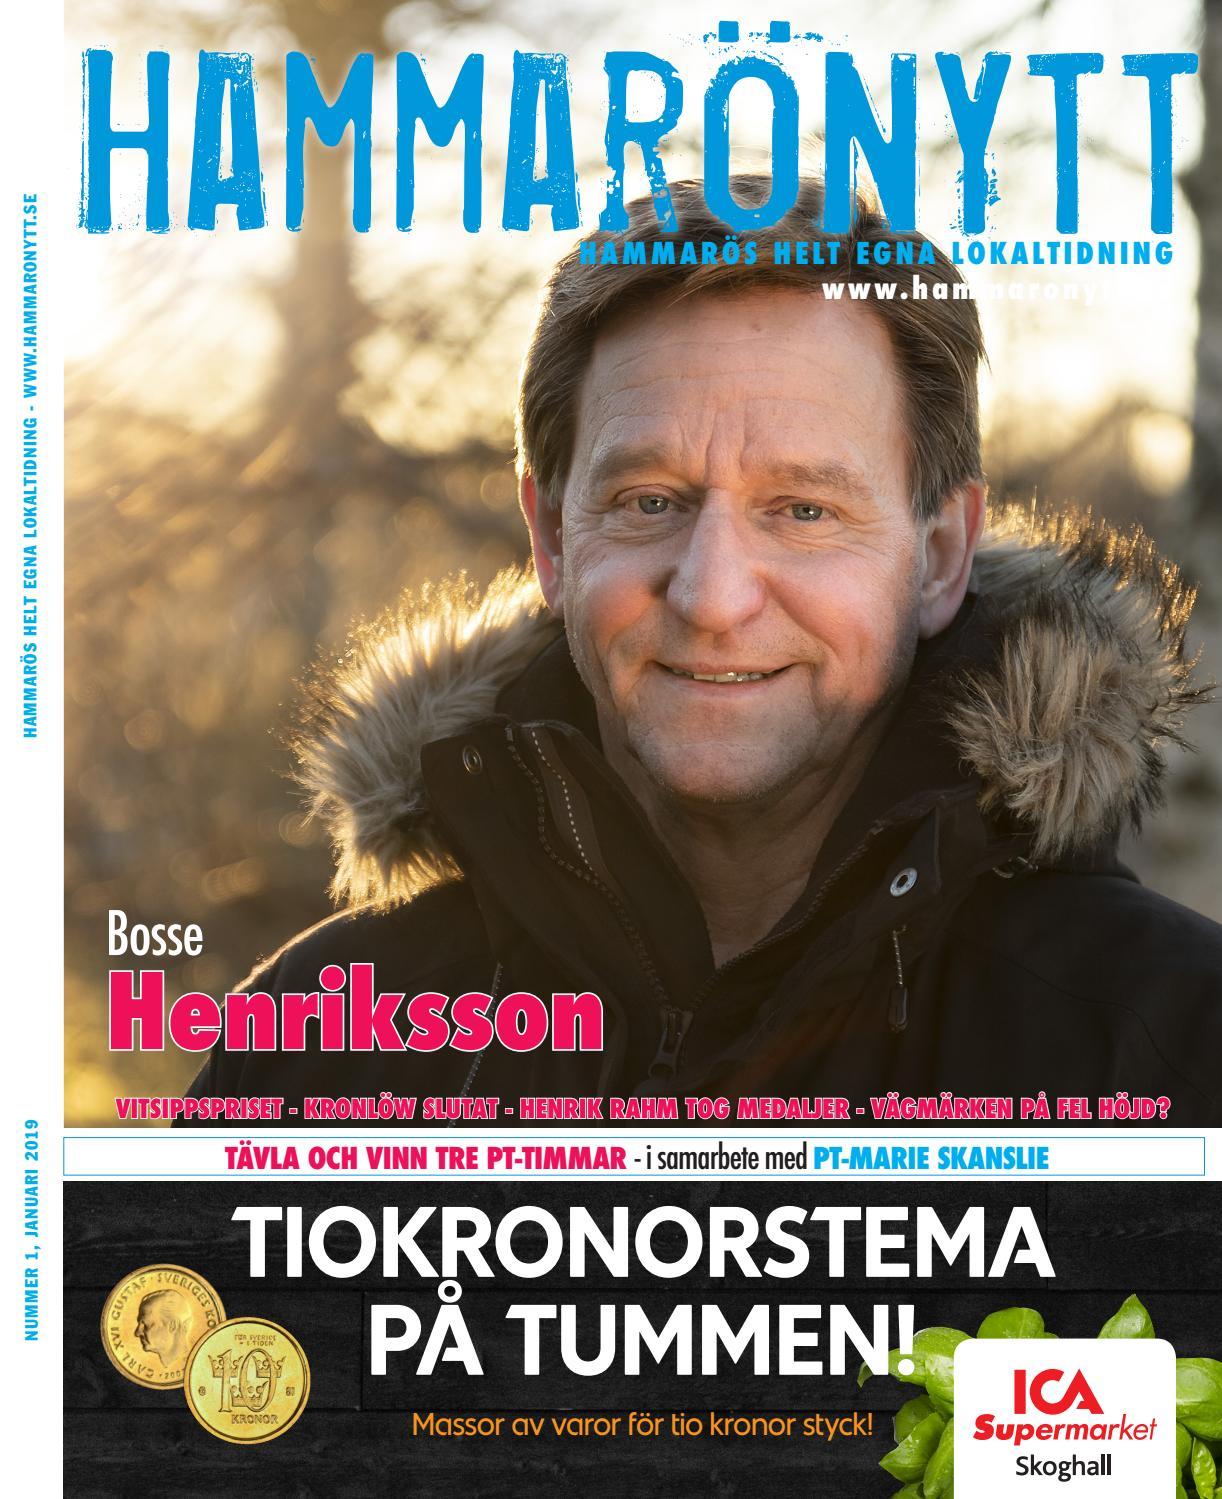 Berit Johansson, Grindstugevgen 6, Hammar | unam.net